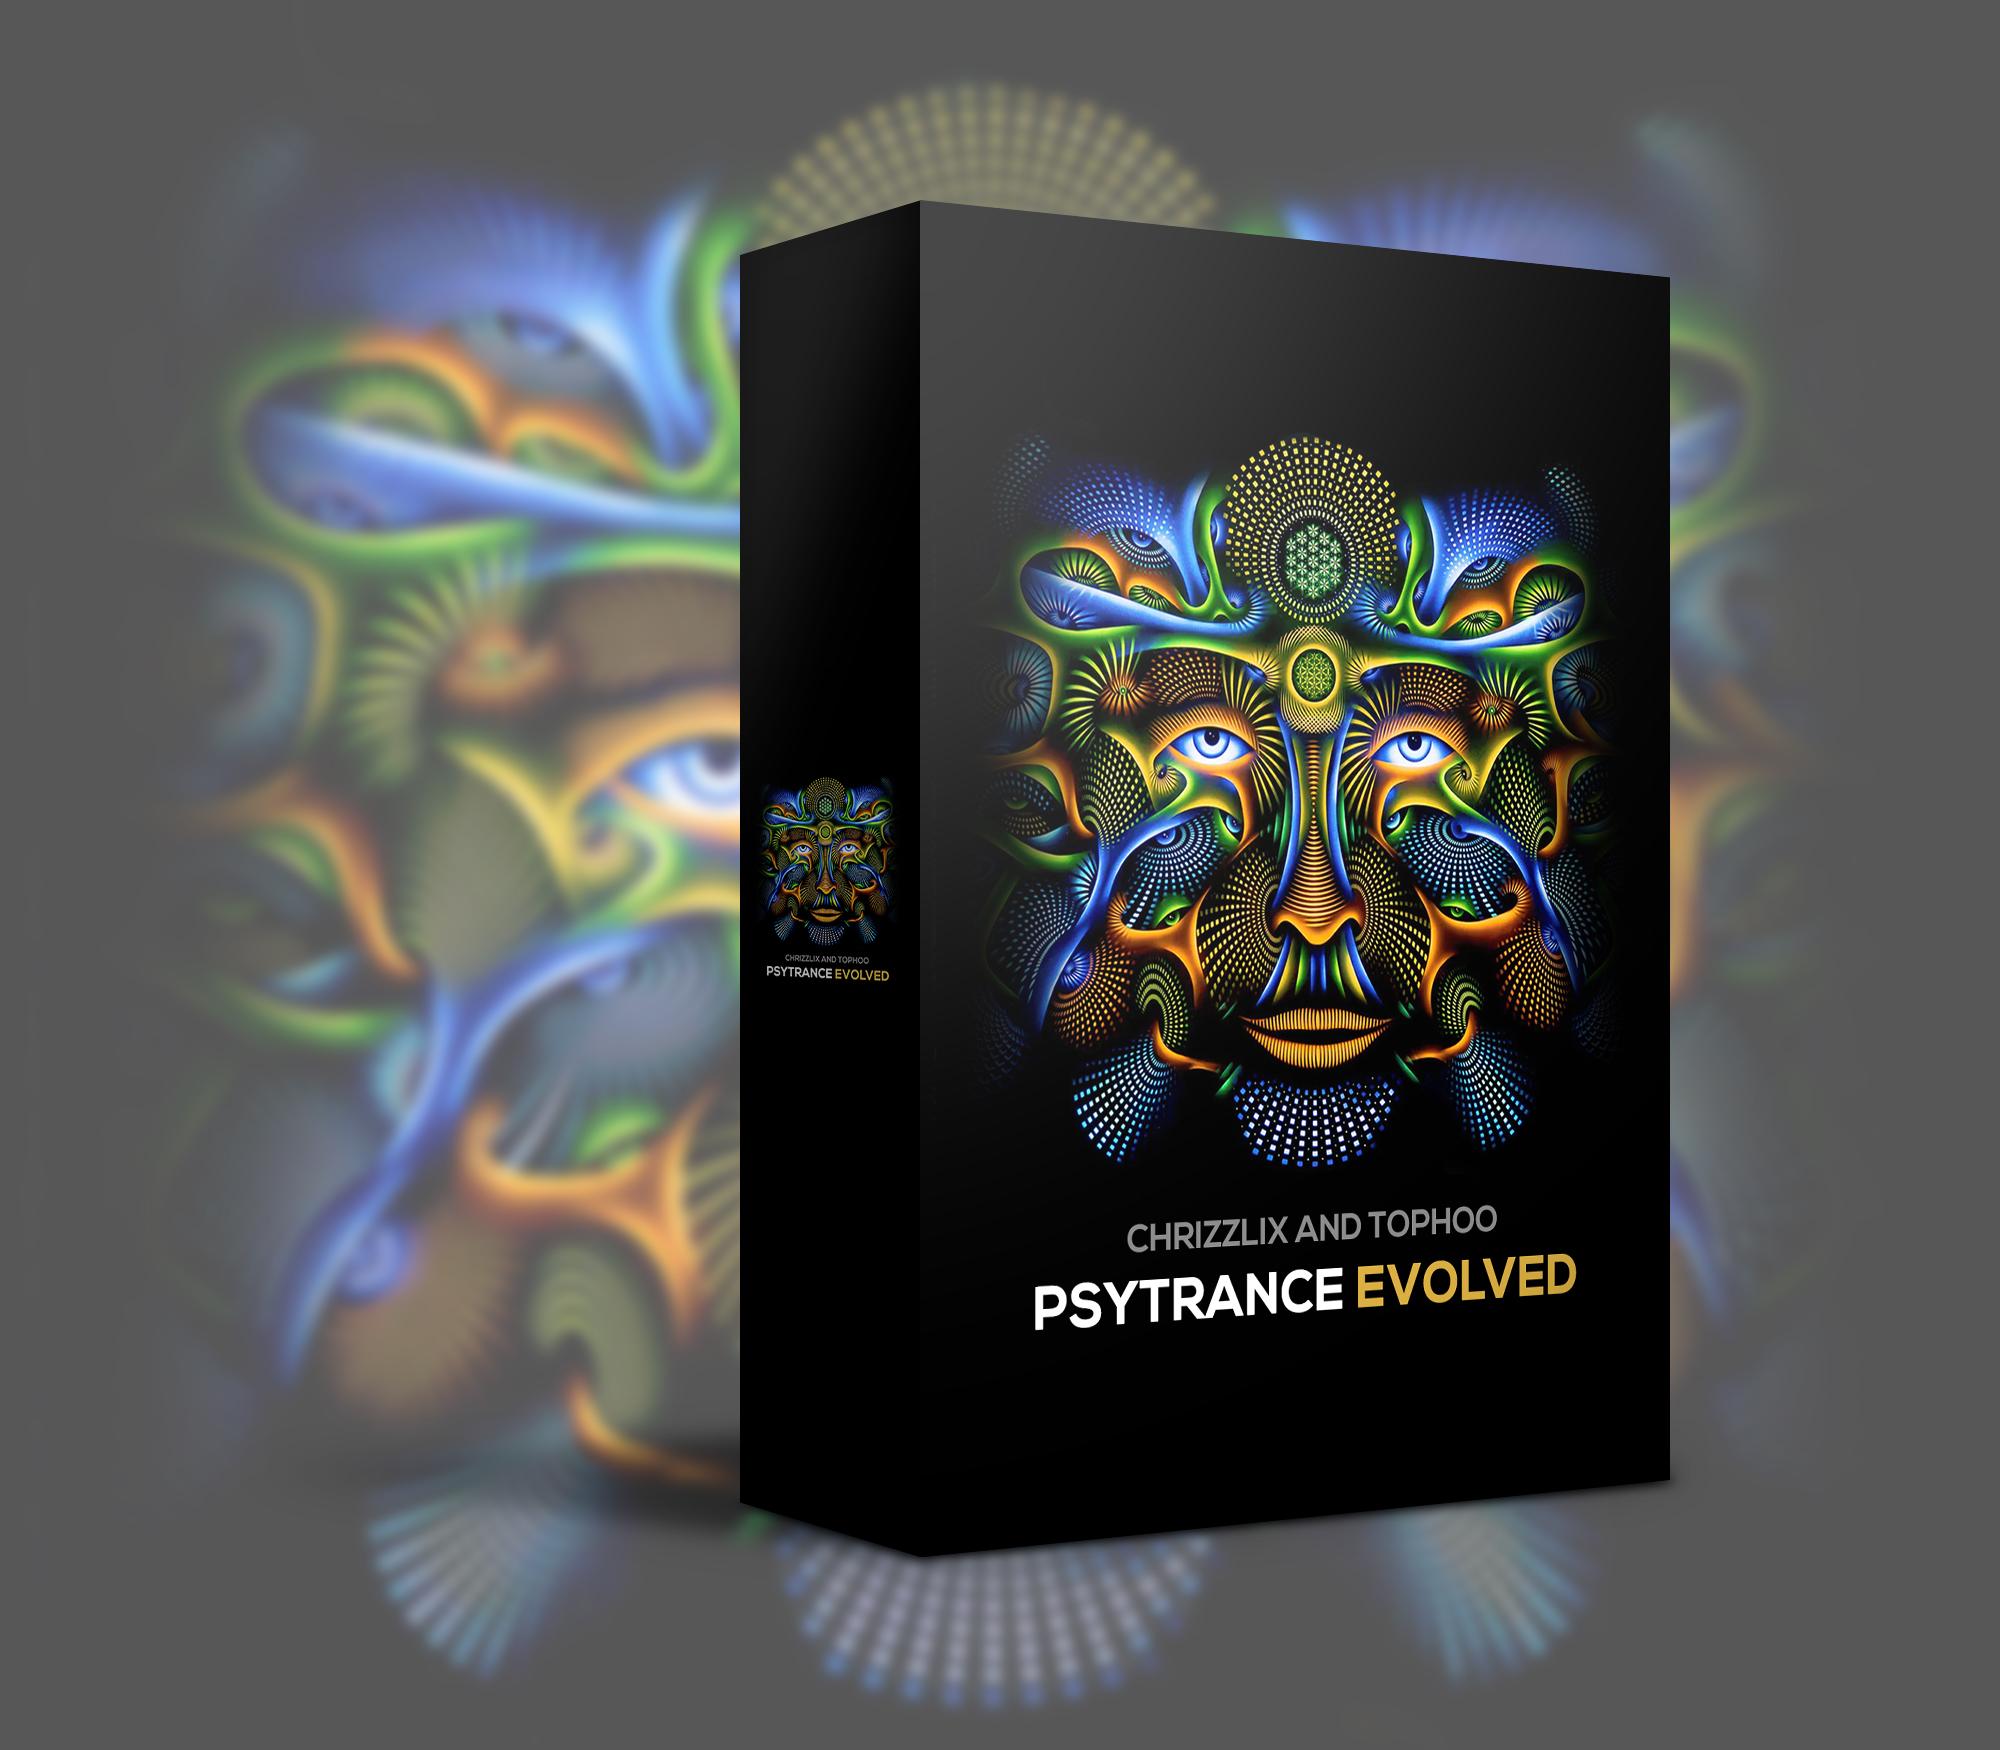 Psytrance Evolved Samplepack by Chrizzlix & Tophoo